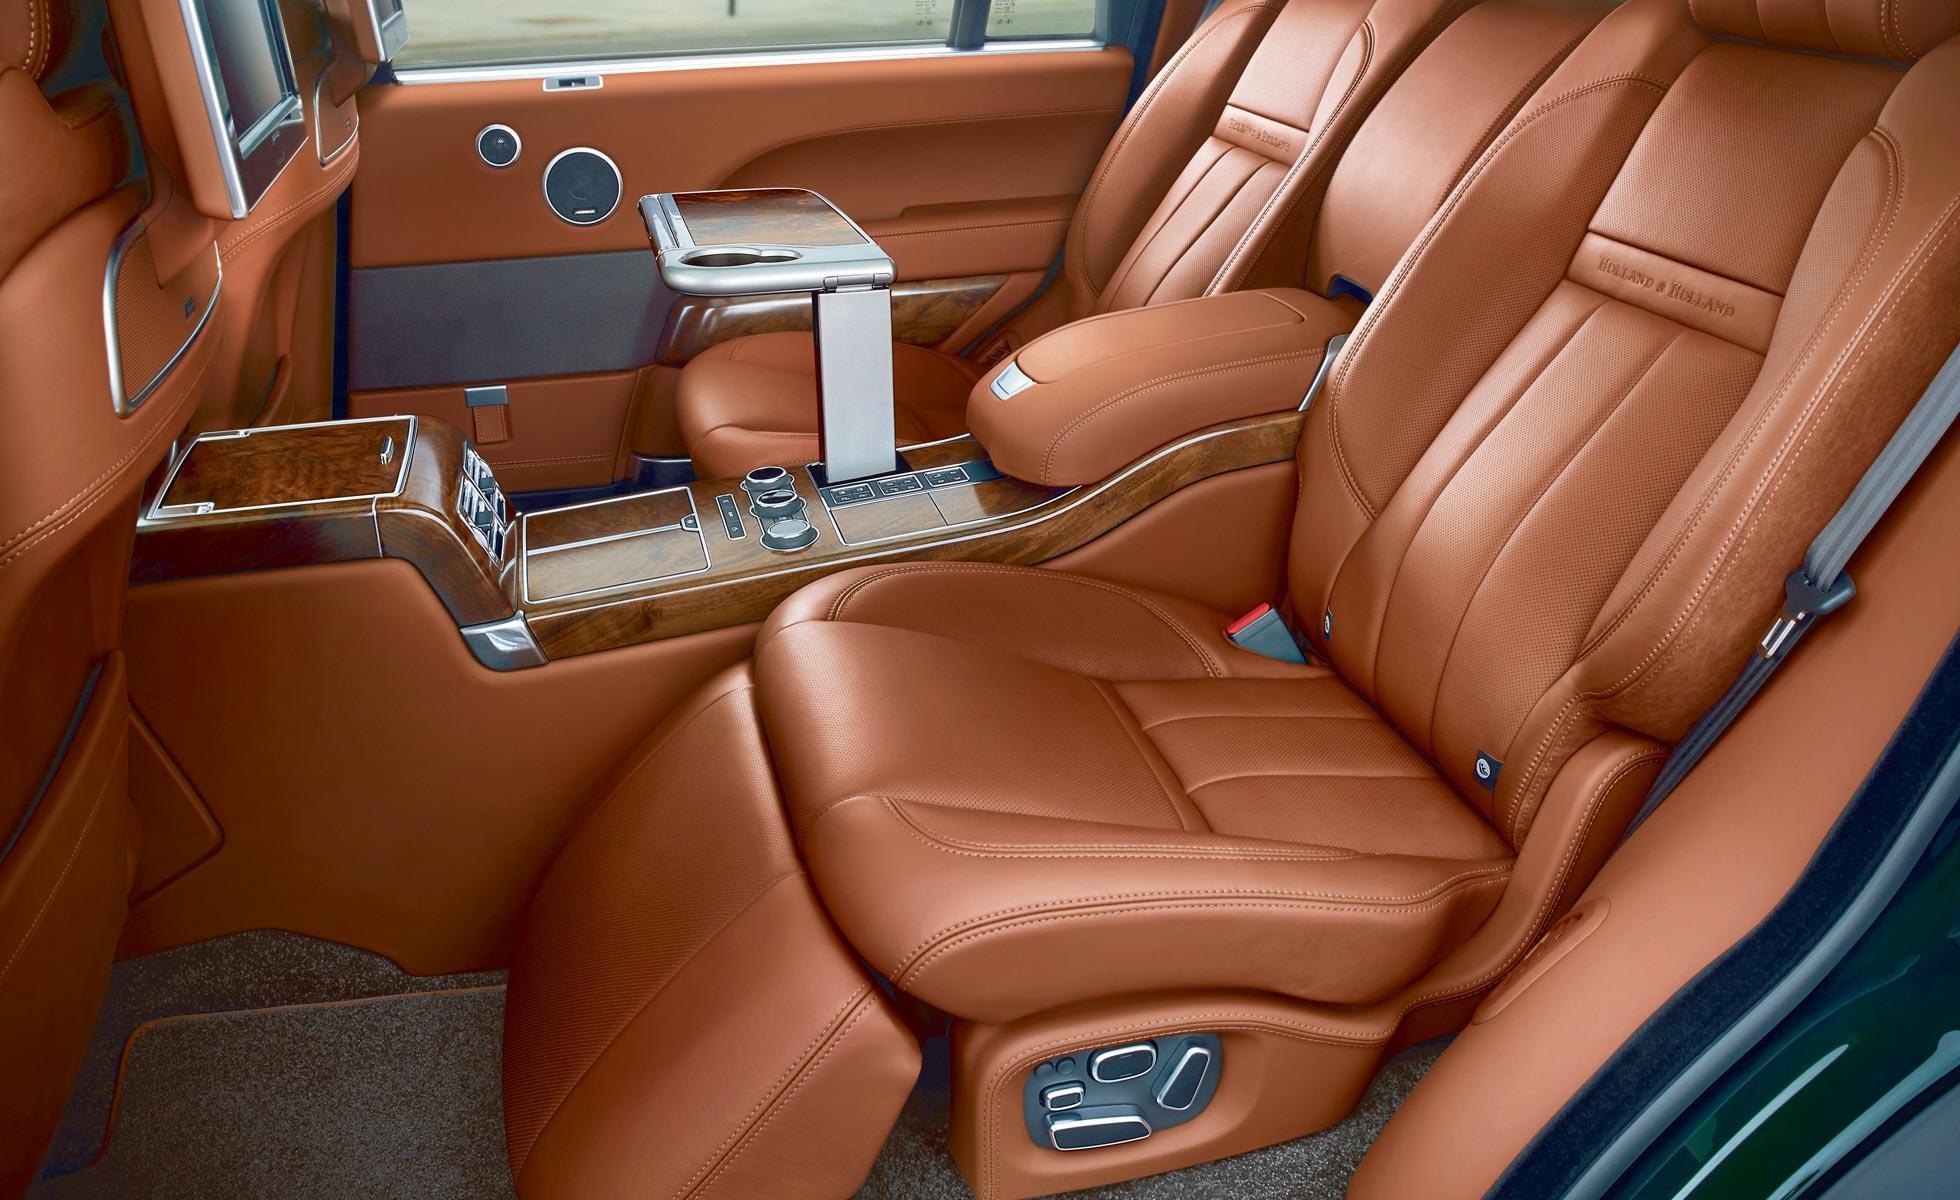 Revealed: the £180,000 Range Rover